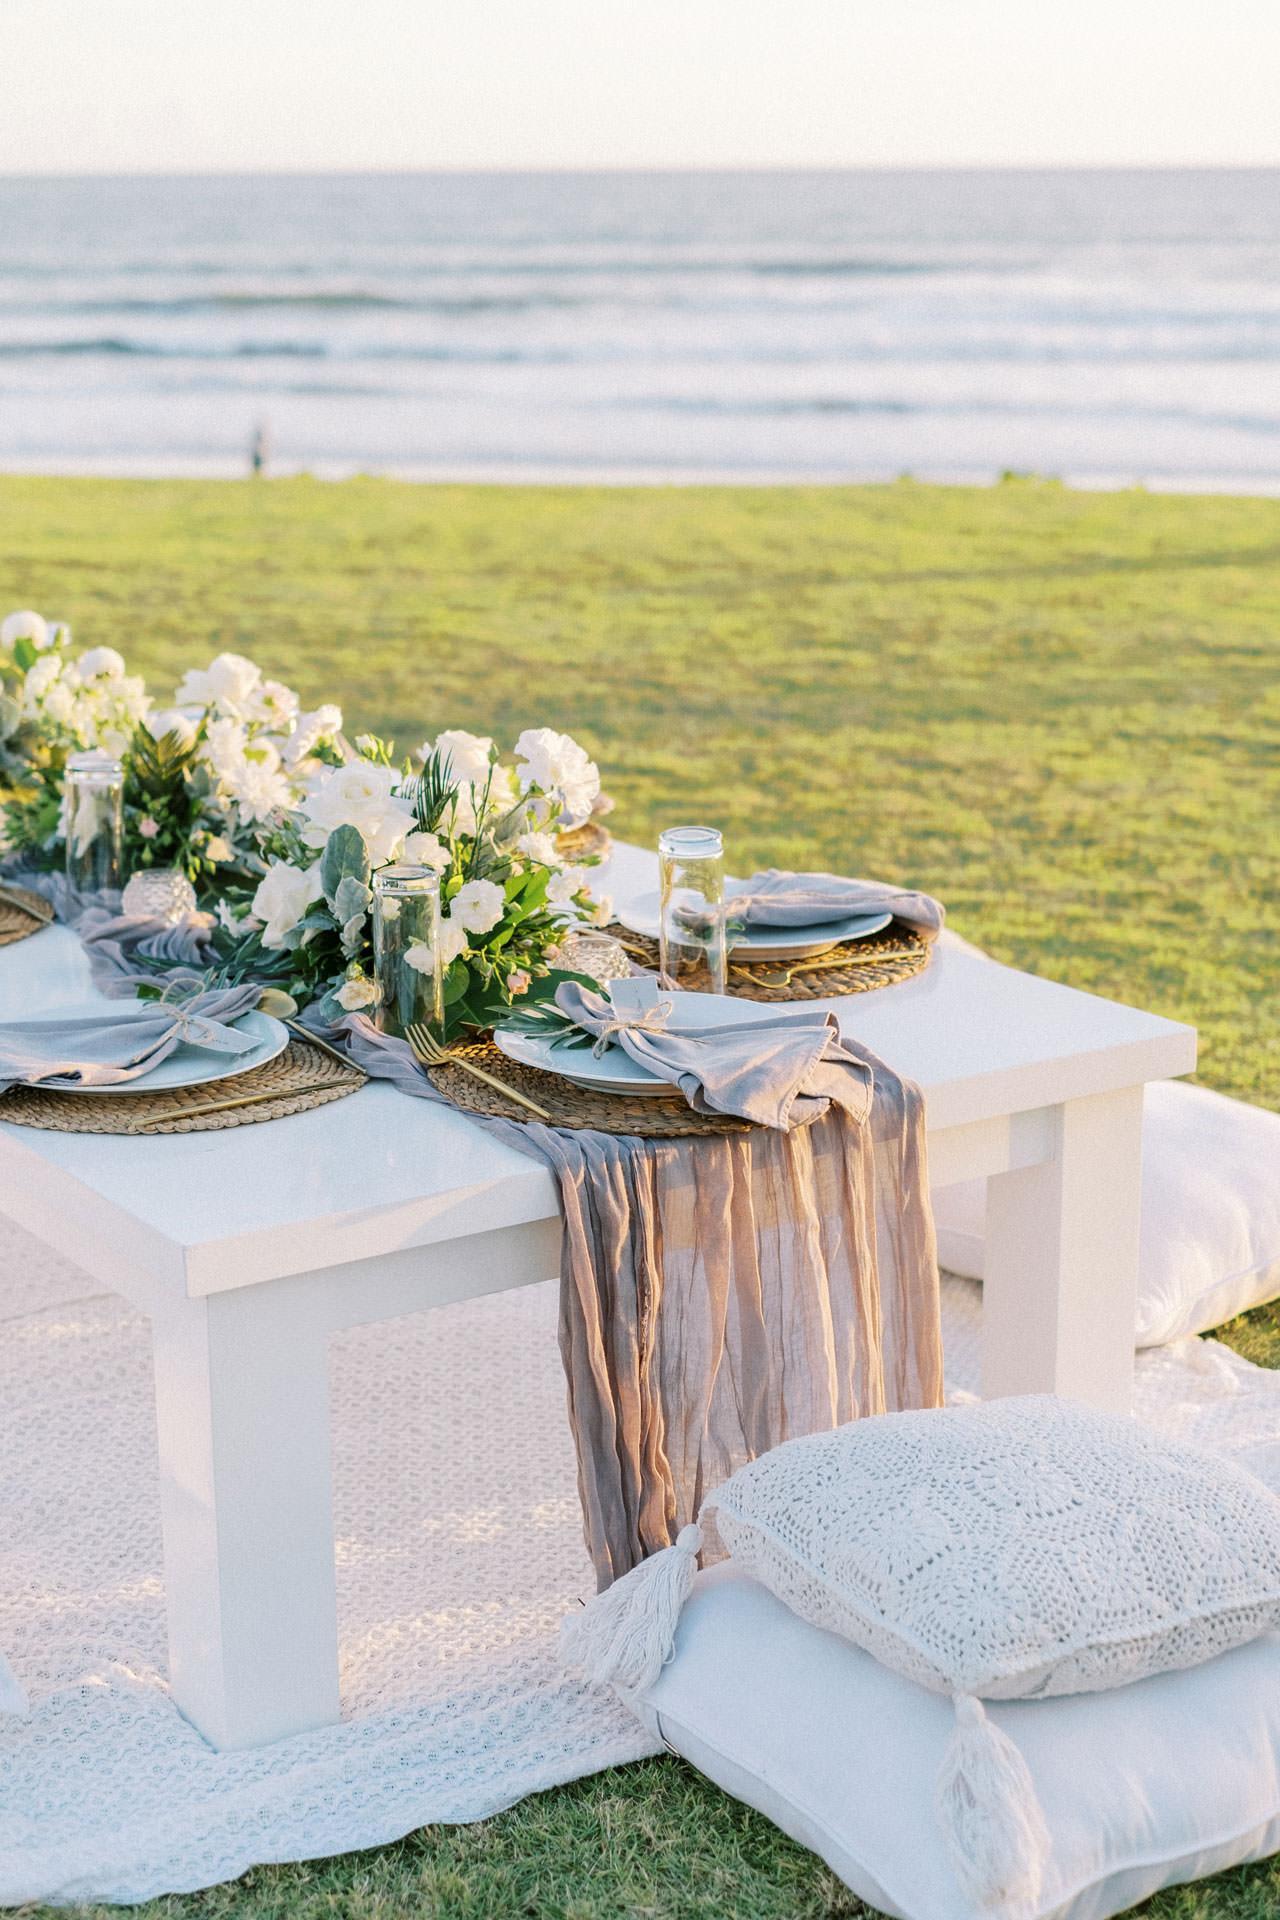 Bali Beach Glamping Wedding on a Luxury Tent 46